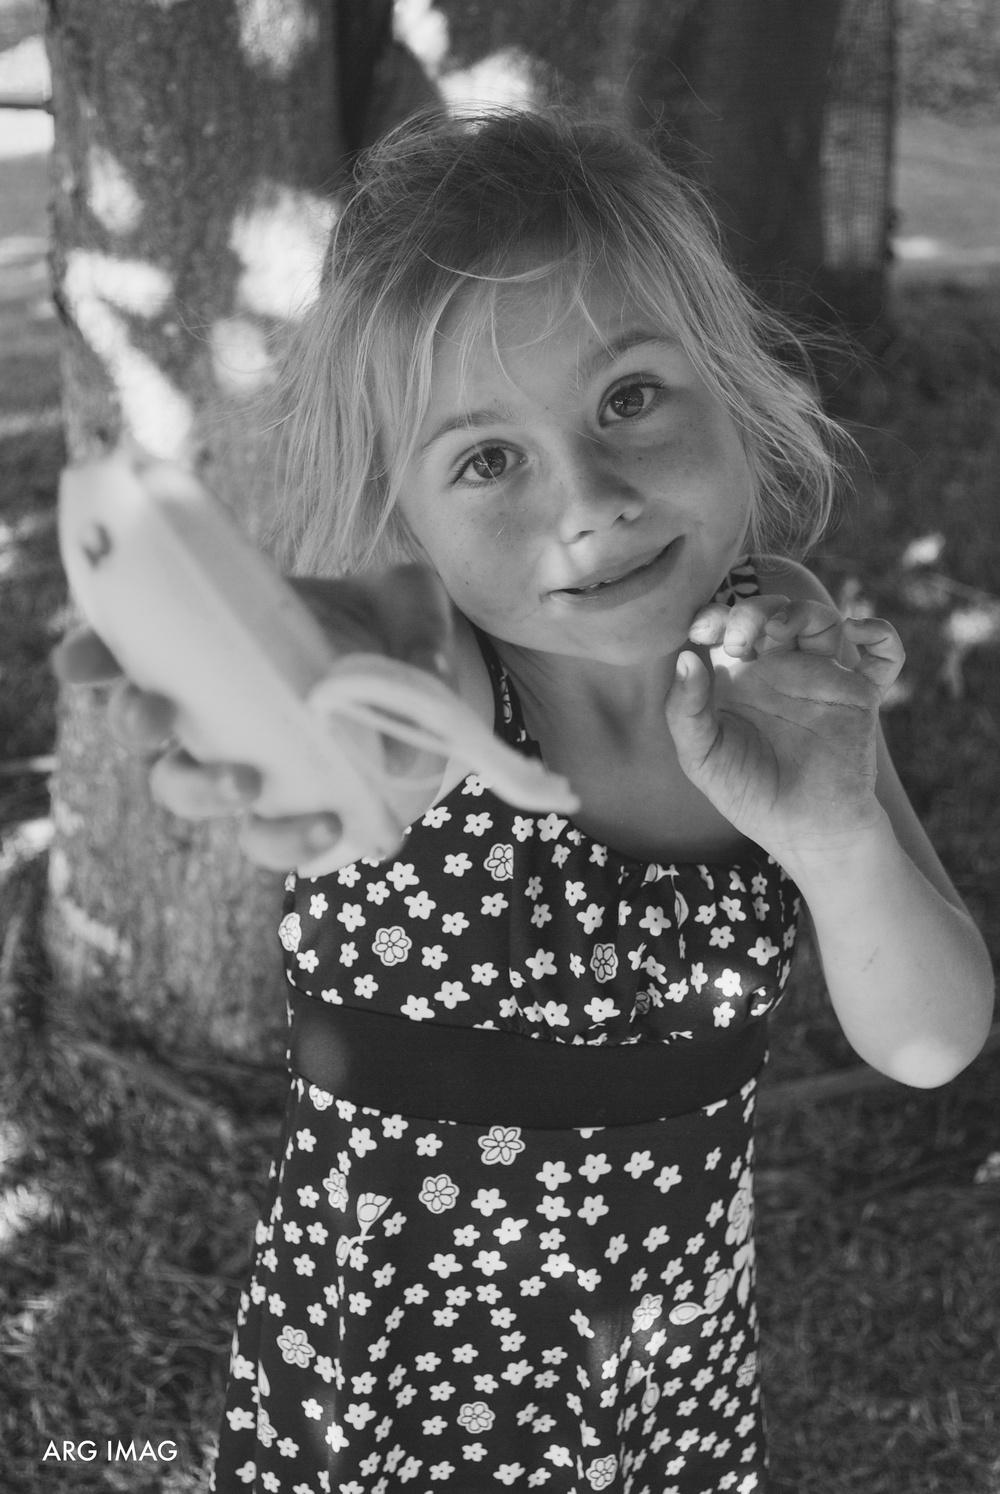 ARG_IMAG_Photography_Finley_6.jpg